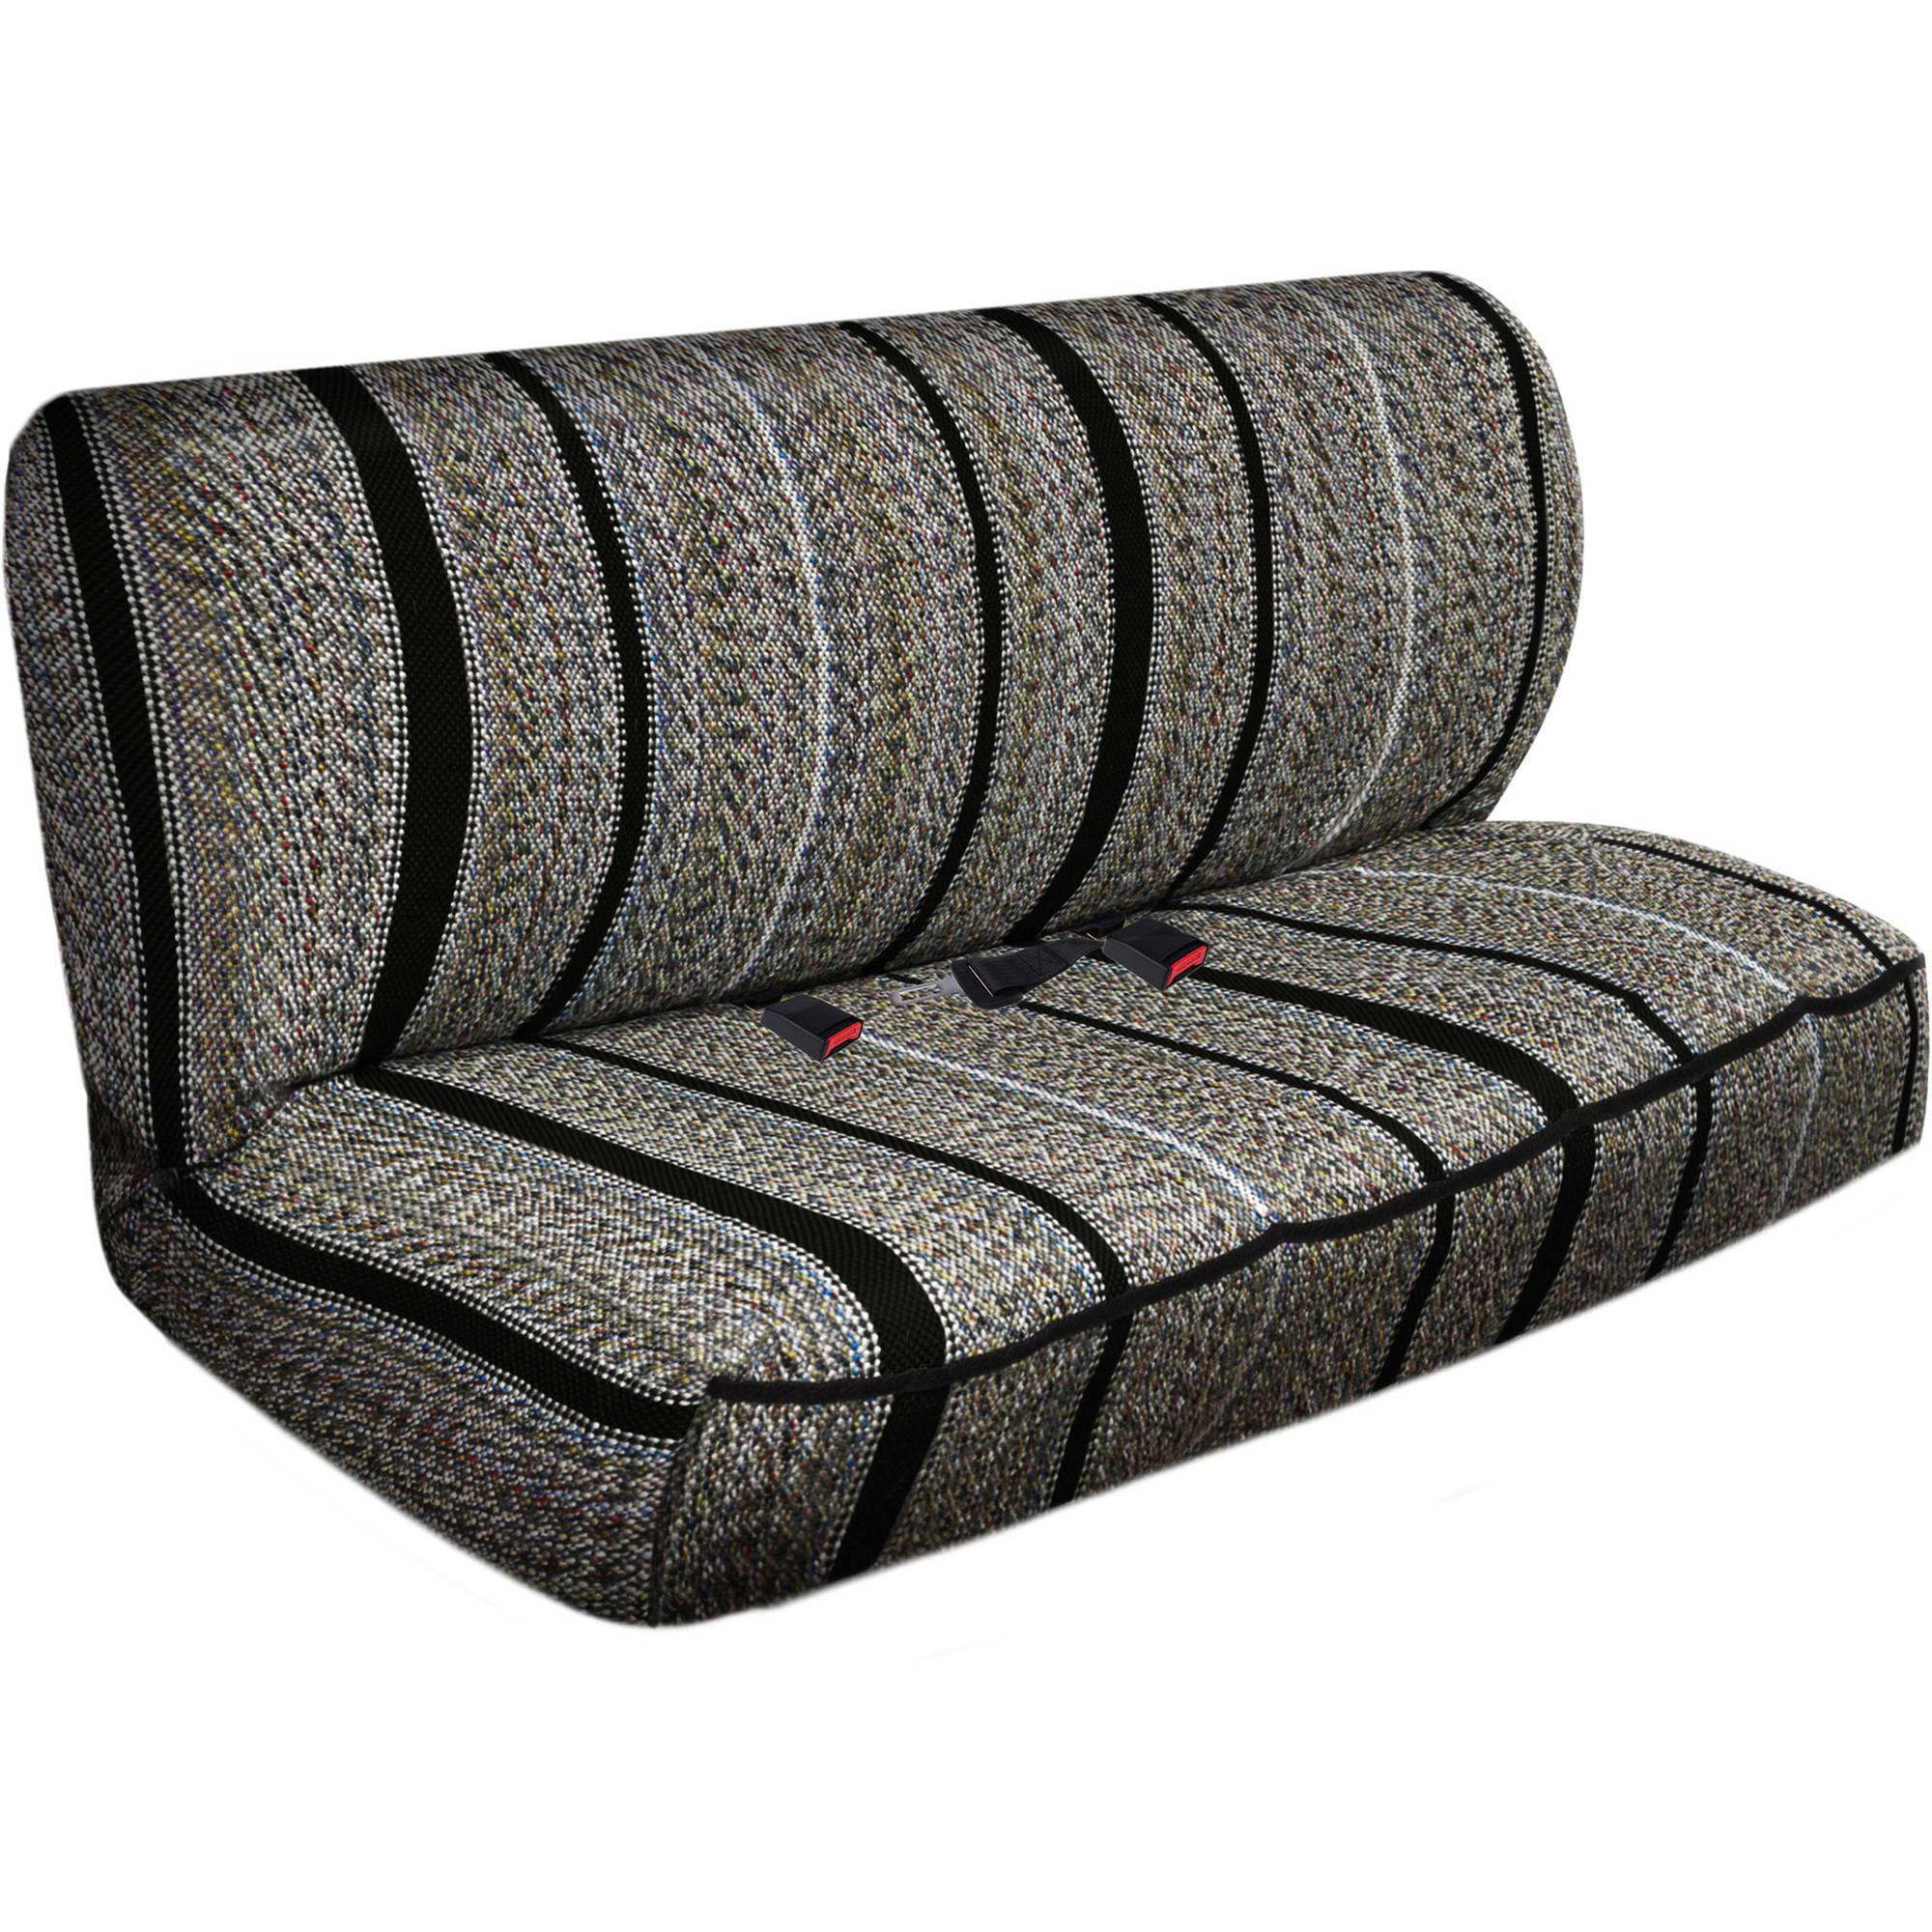 OxGord 2-Piece Full Size Heavy Duty Saddle Blanket Bench Seat Covers, Black